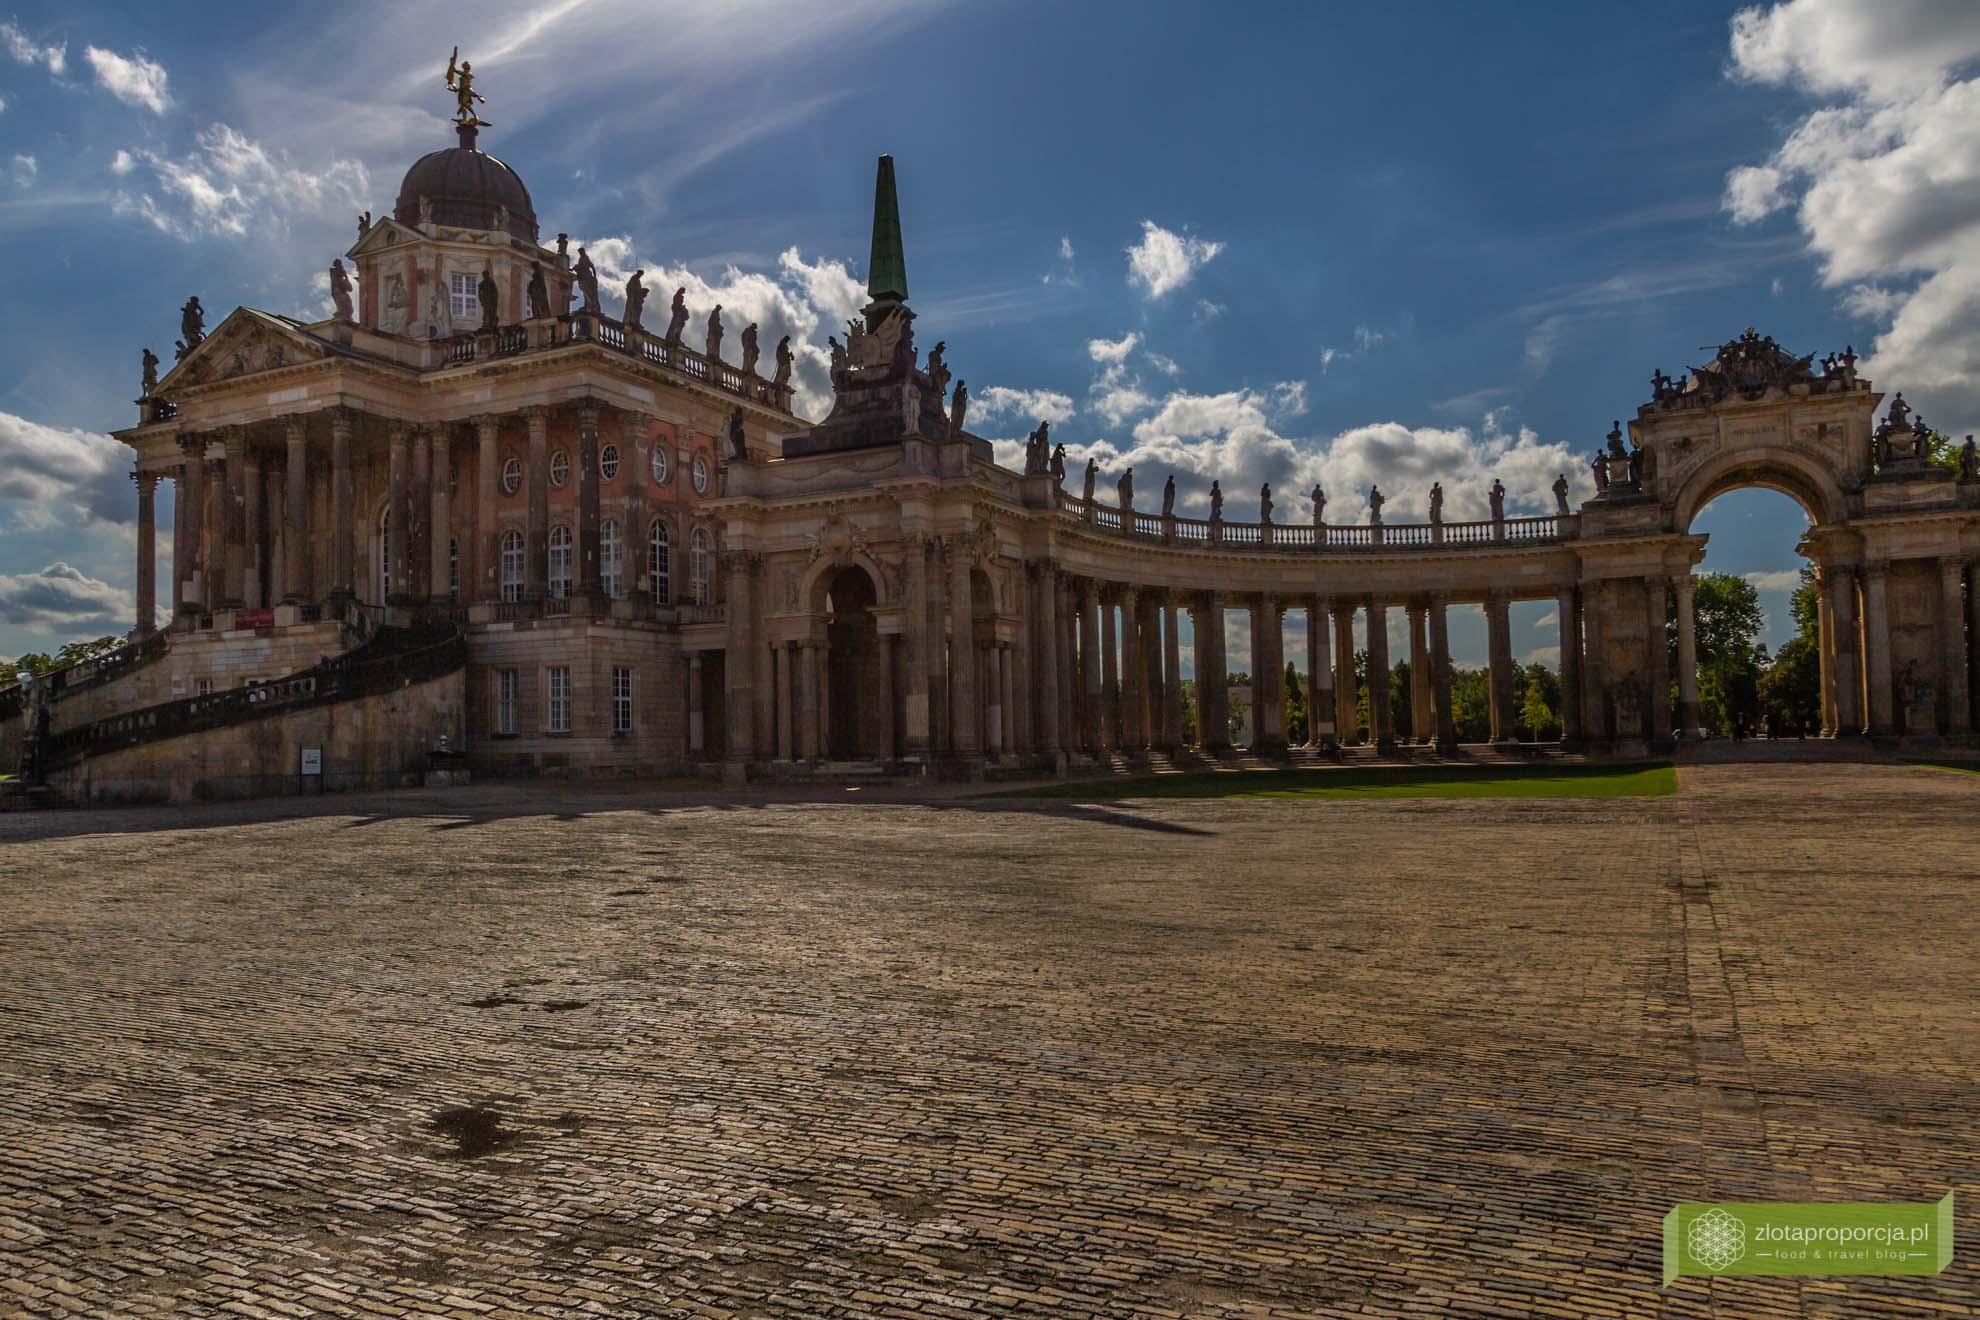 Poczdam, atrakcje Poczdamu, Brandenburgia, atrakcje Brandenburgii; Sanssouci; Poczdam Sanssouci; Park Sanssouci; Pałac Sanssouci; Neues Palais